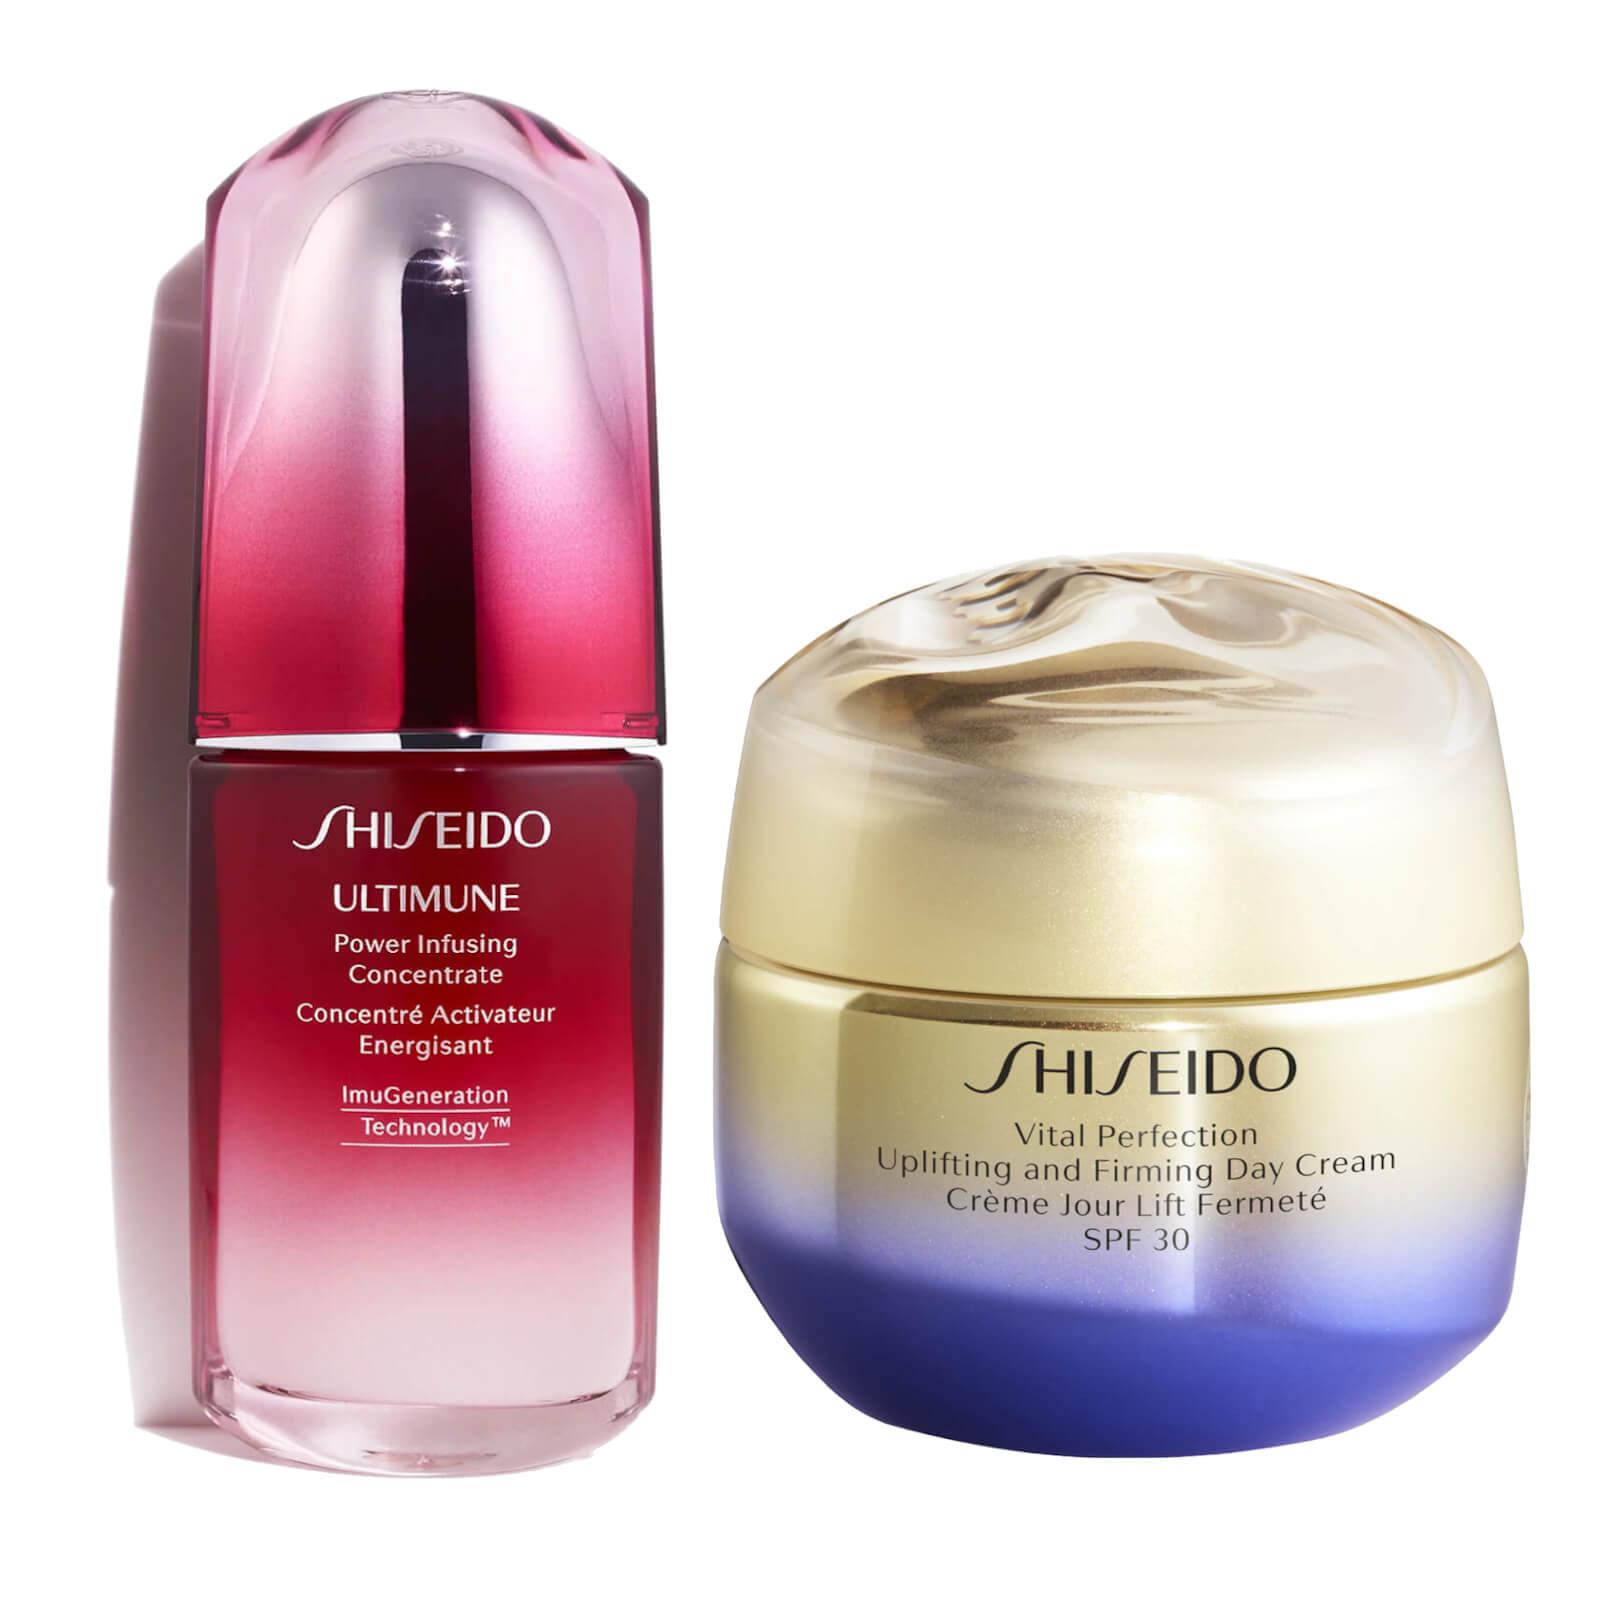 Купить Shiseido Vital Perfection Uplifting Day Cream and Ultimune 50ml Bundle